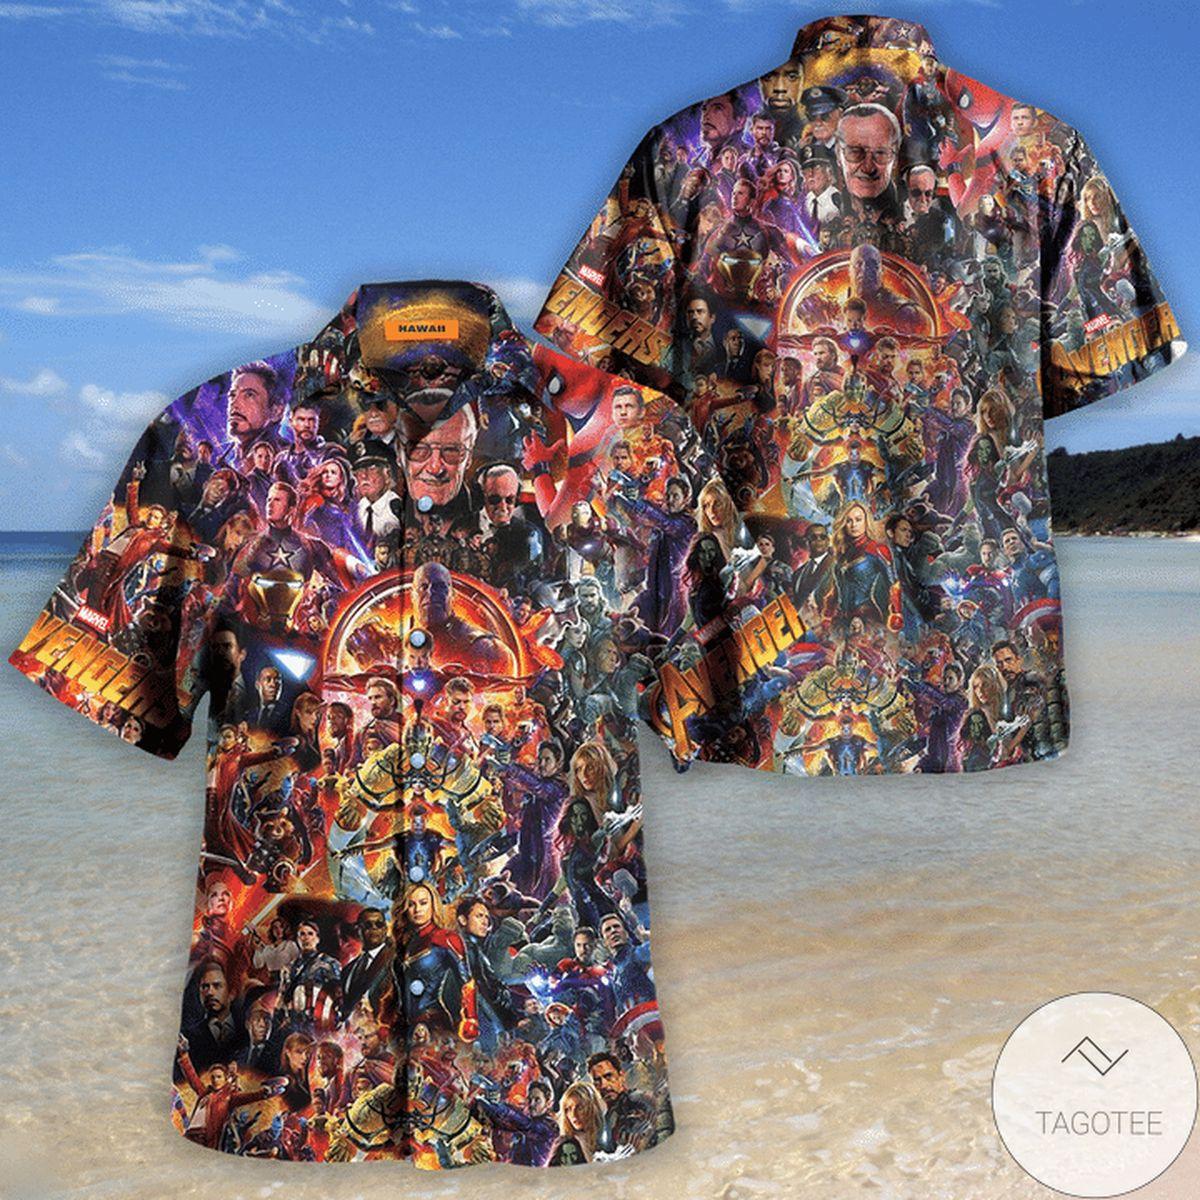 Discount Avengers I Love You 3000 Unisex Hawaiian Shirt